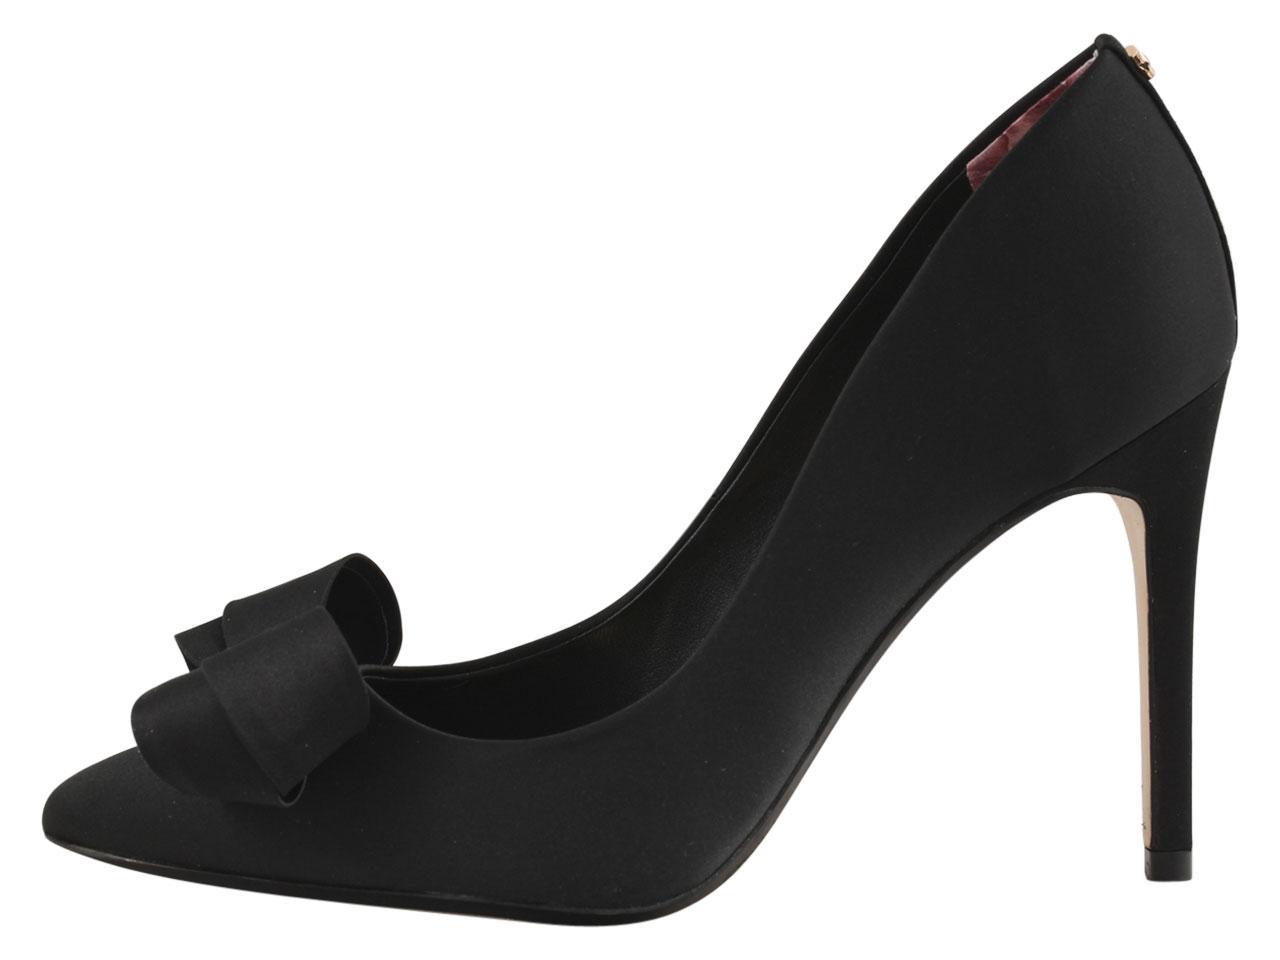 4ec012393ee2b Ted Baker Women s Skalett Pumps Heels Shoes by Ted Baker. 1234567